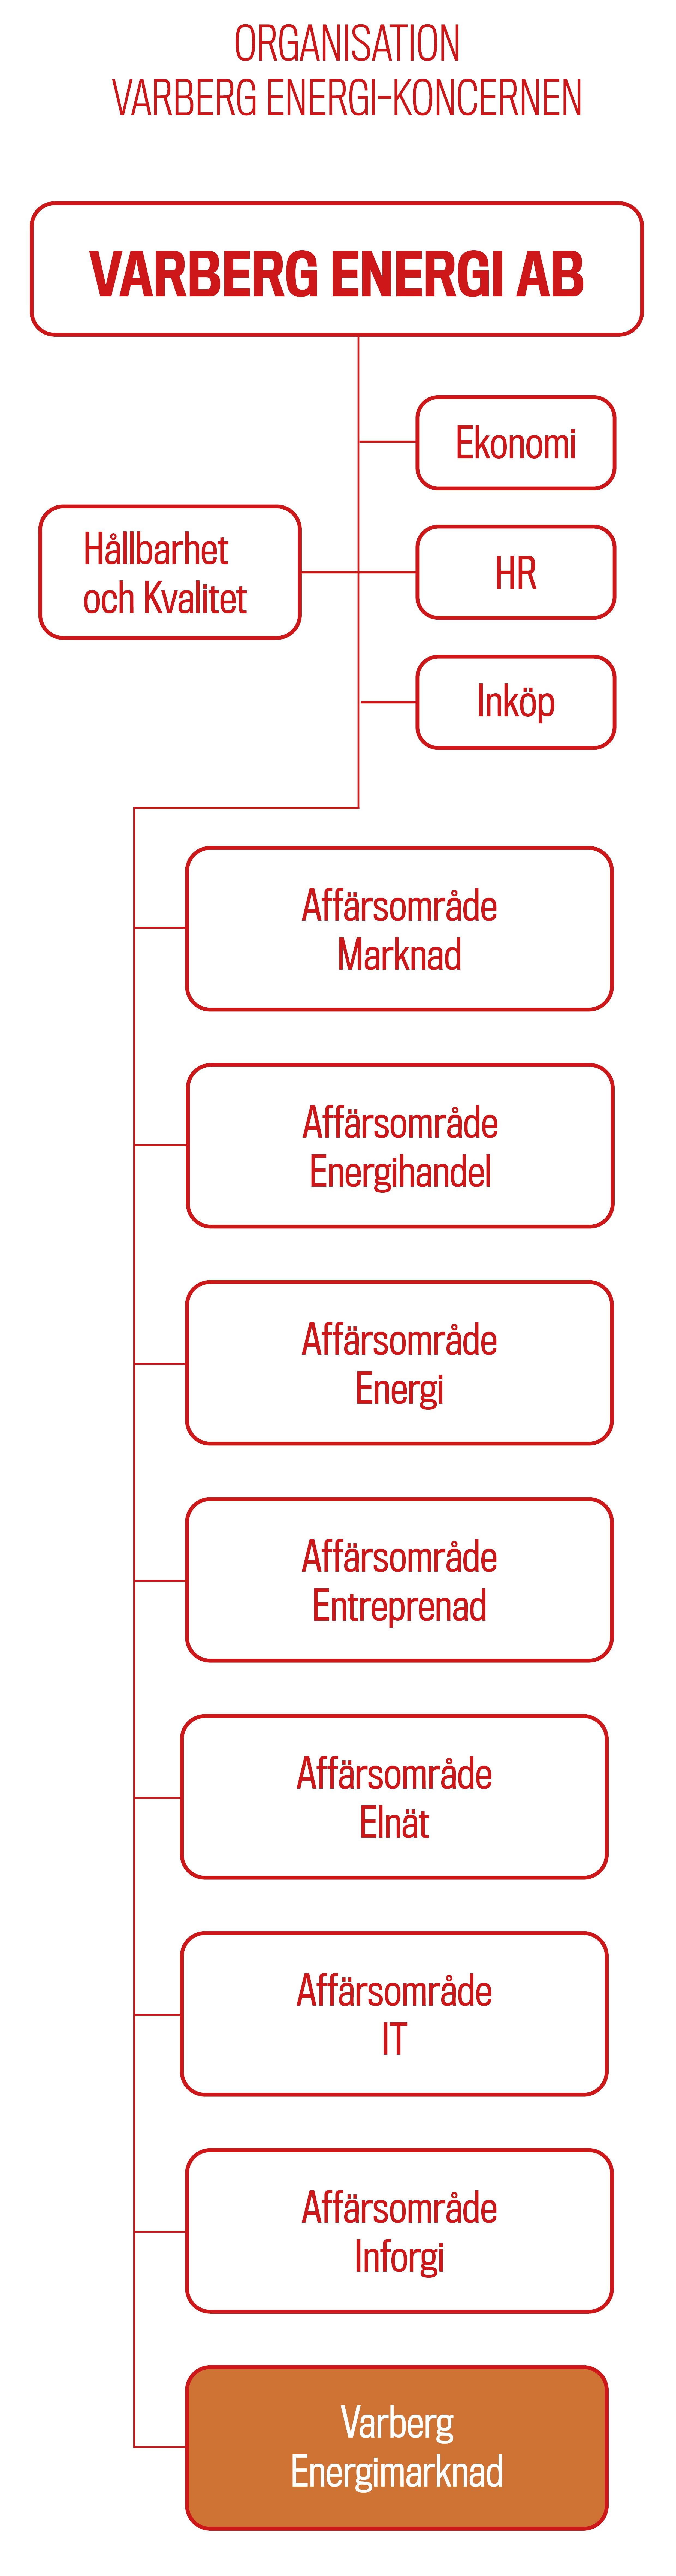 Illustrtion vårt organisationsschema